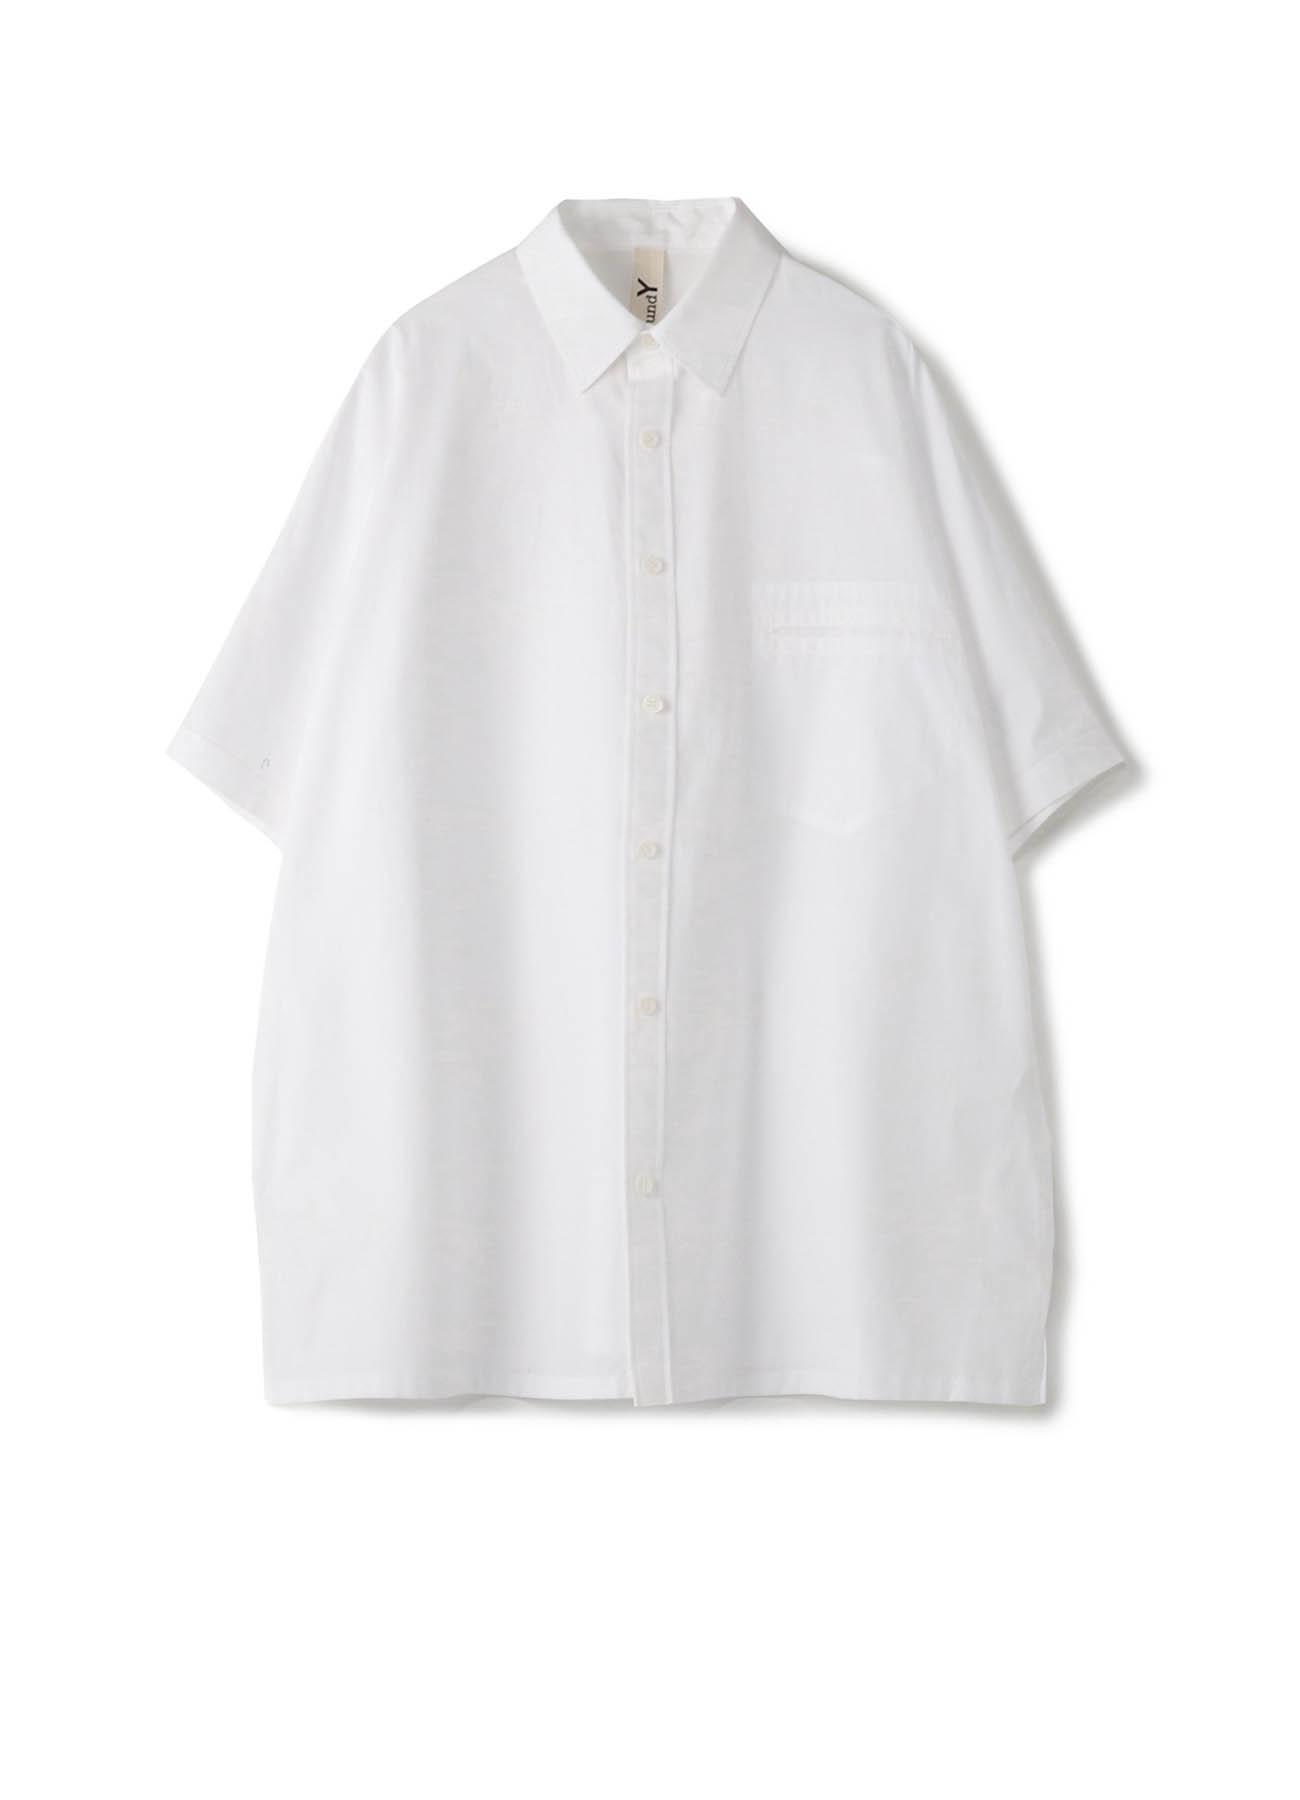 100/2 Cotton Broad Dolman Short Sleeves Shirt